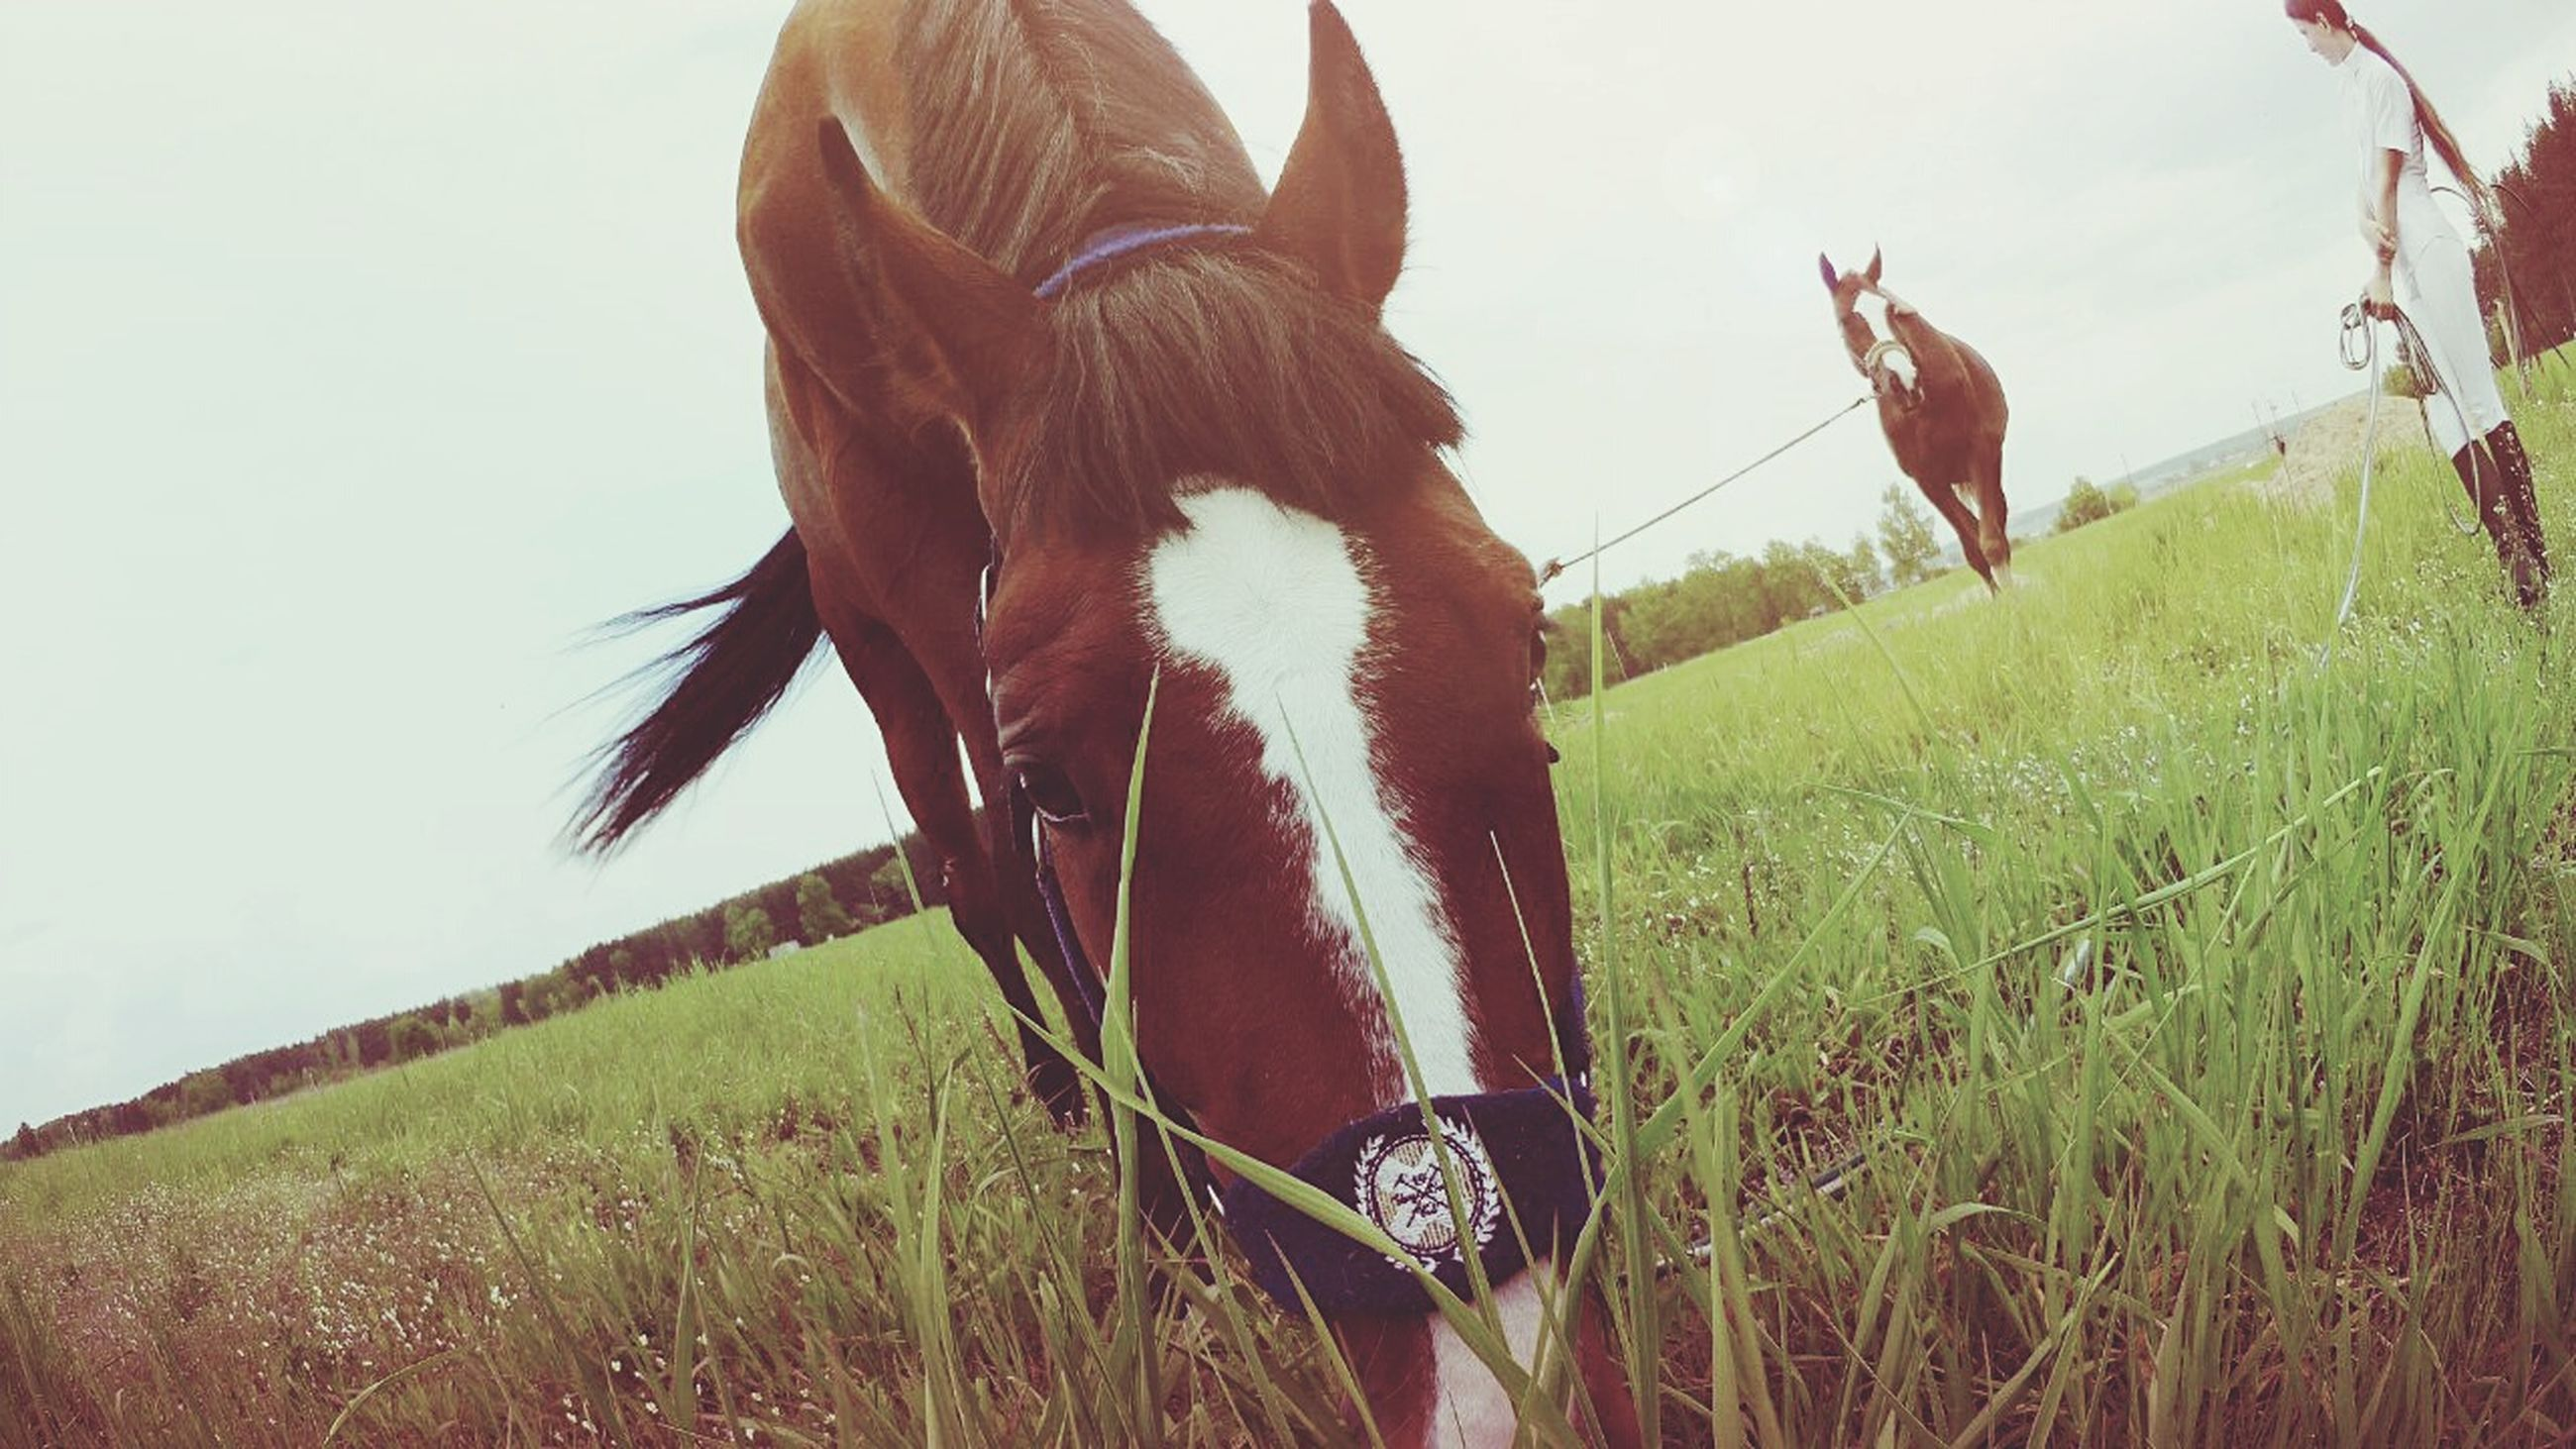 horse, animal themes, field, grass, livestock, domestic animals, mammal, one animal, standing, herbivorous, grassy, sky, working animal, landscape, nature, day, grazing, giraffe, outdoors, cow